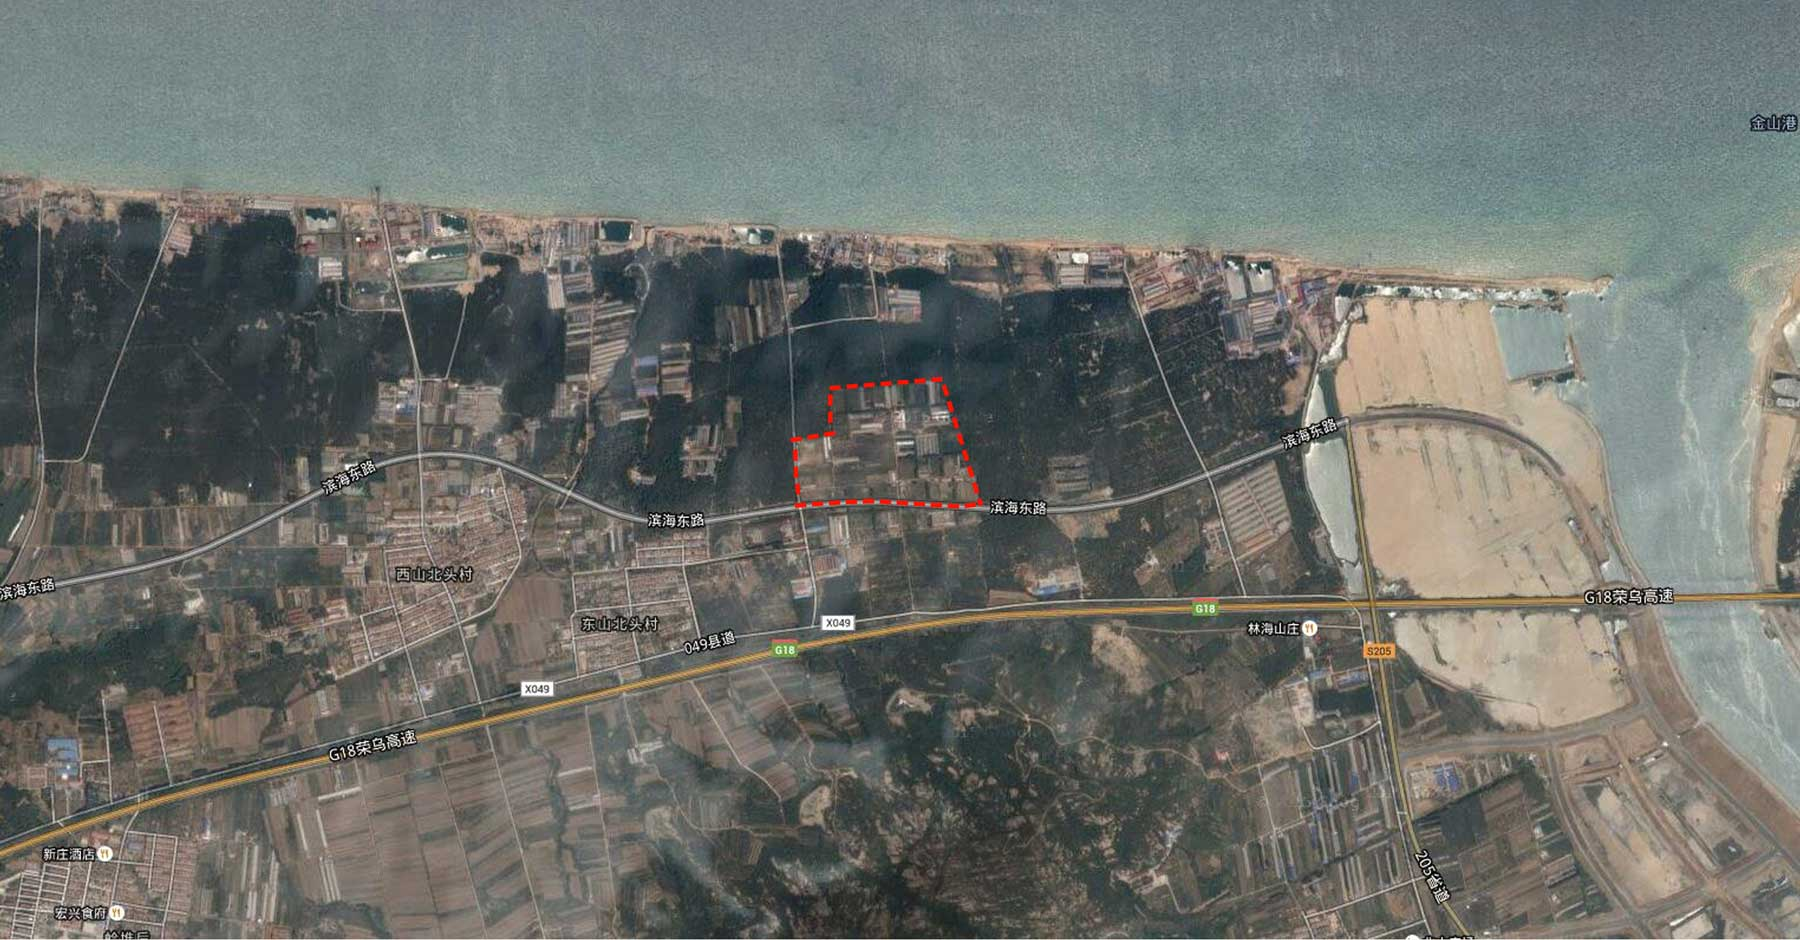 Plot E Masterplan en Yantai (China)